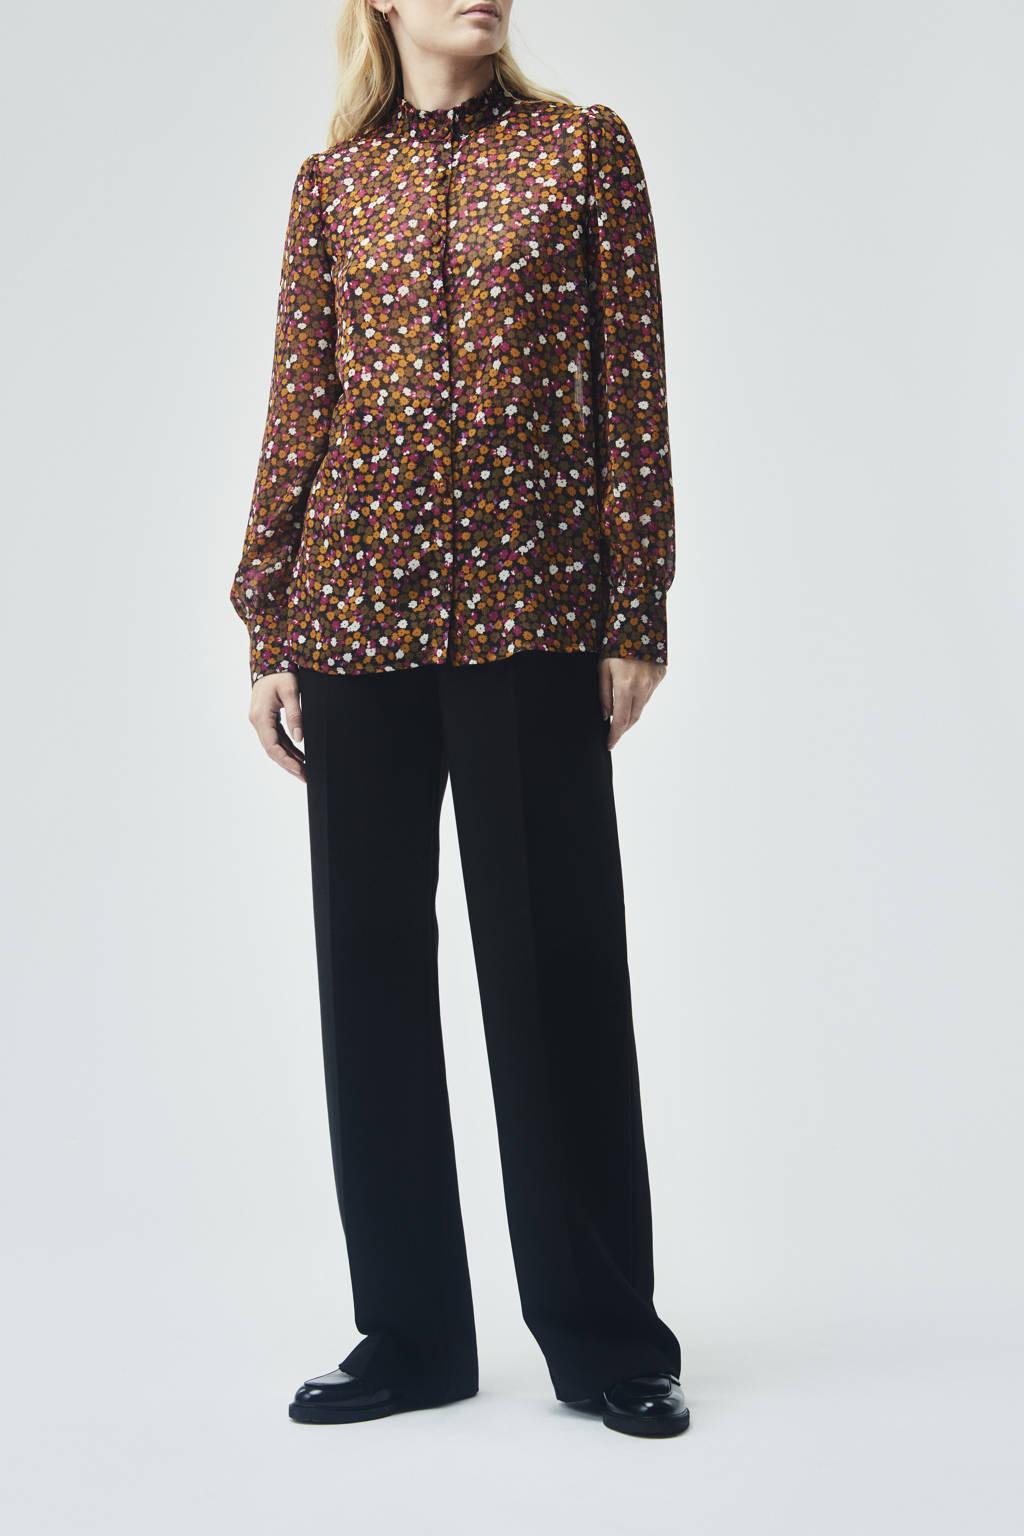 Modström gebloemde semi-transparante geweven blouse Gryffin van gerecycled polyester bruin/ fuchsia, Bruin/ fuchsia